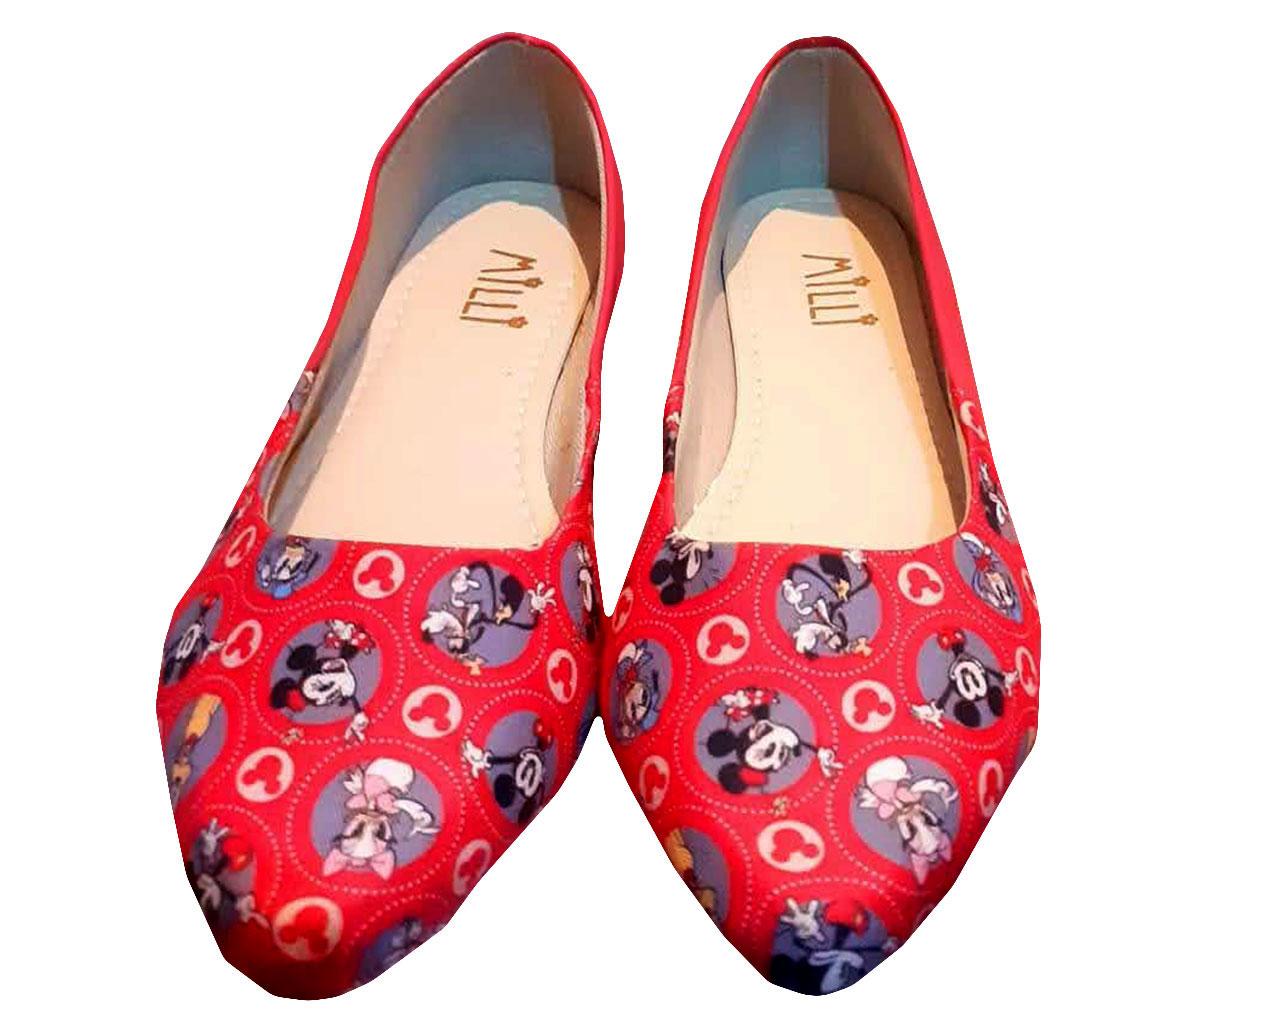 Sapatilha Feminina Estampada Milli Disney Vermelha